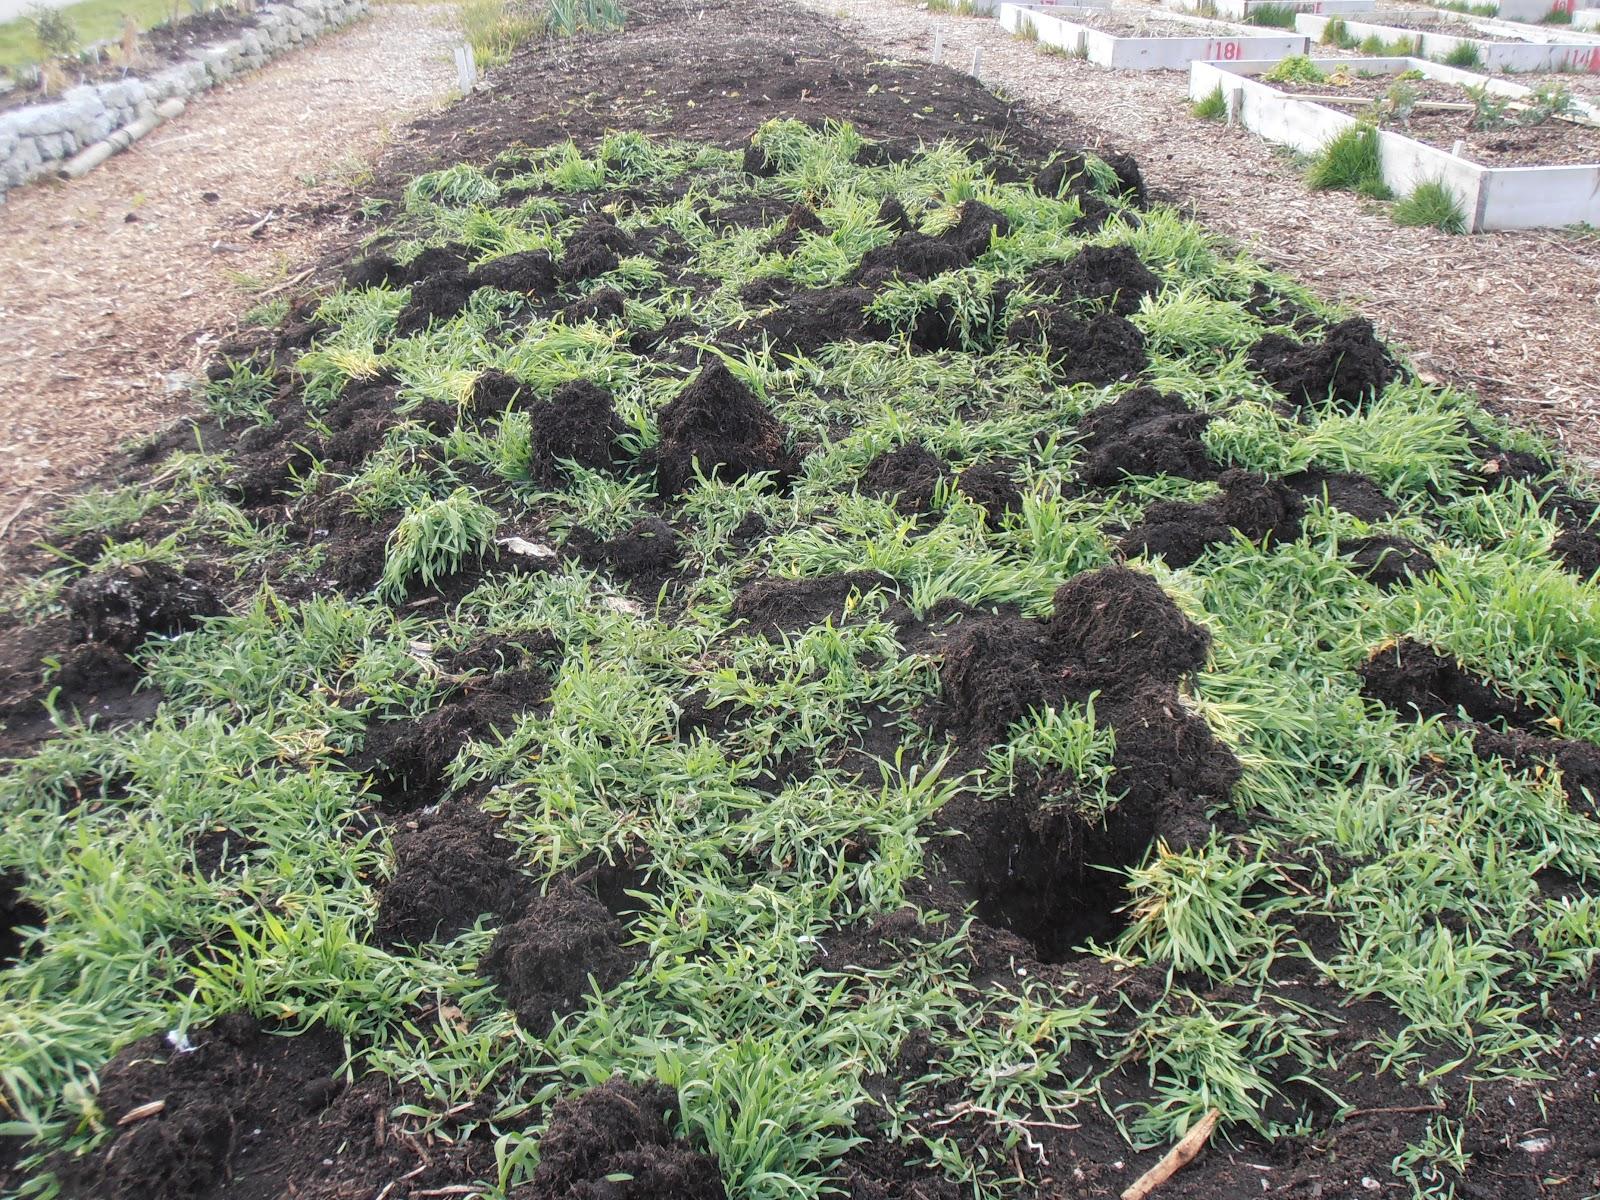 Ladner Community Garden Planting The School Garden In March